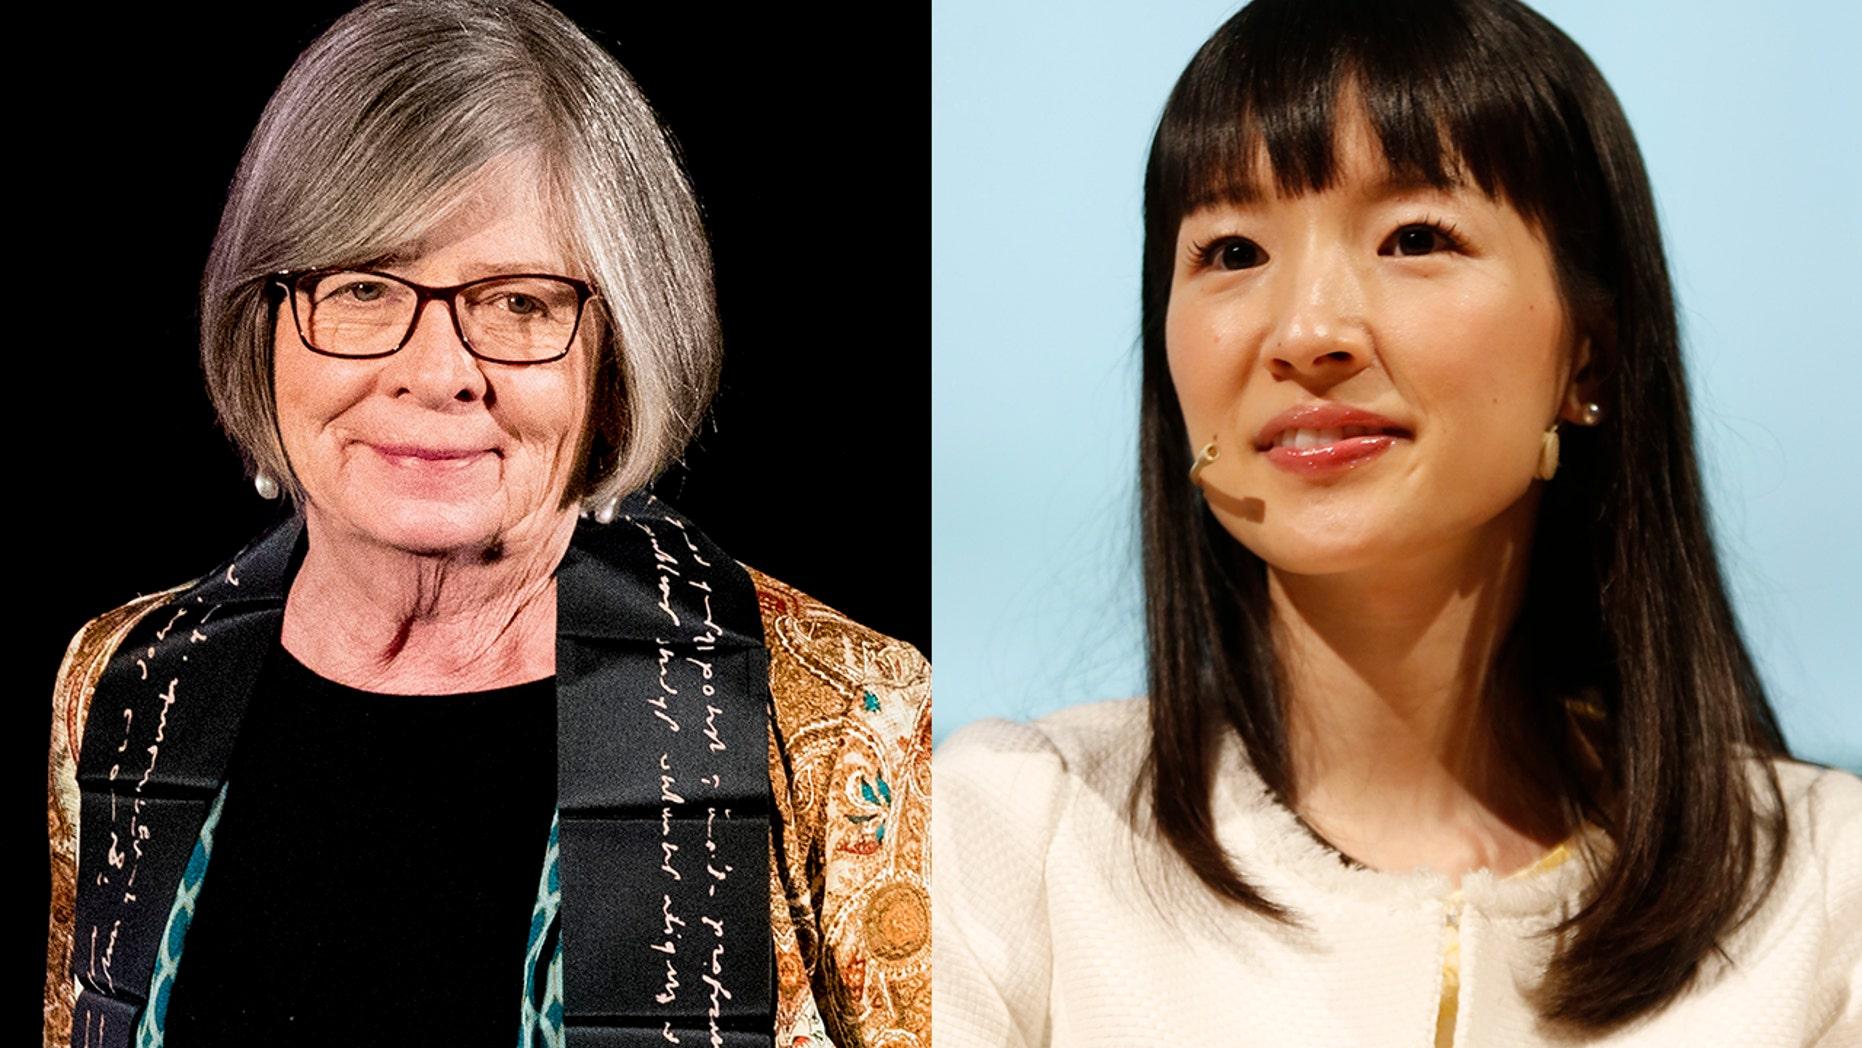 Barbara Ehrenreich has been accused of writing racist tweets against Netflix star Marie Kondo.